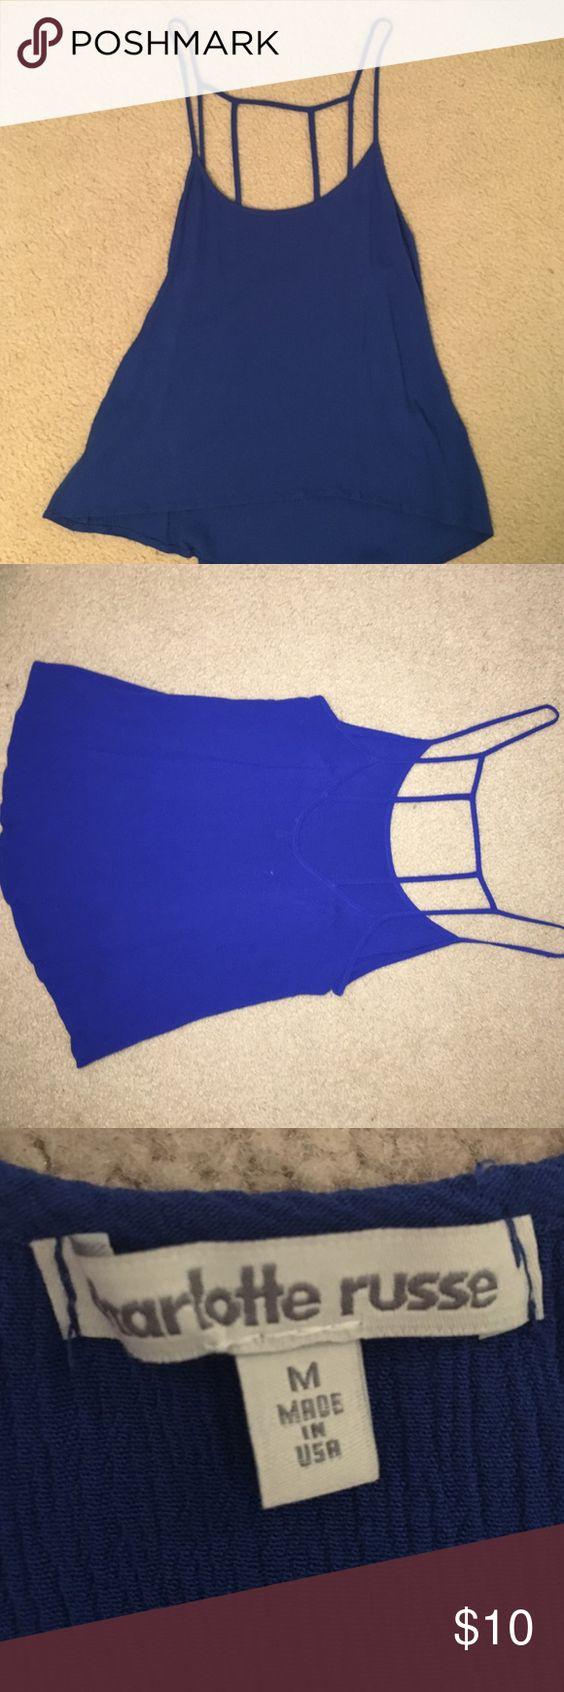 Charlotte Russe royal crop top Royal blue crop top, size medium, never worn Tops Crop Tops